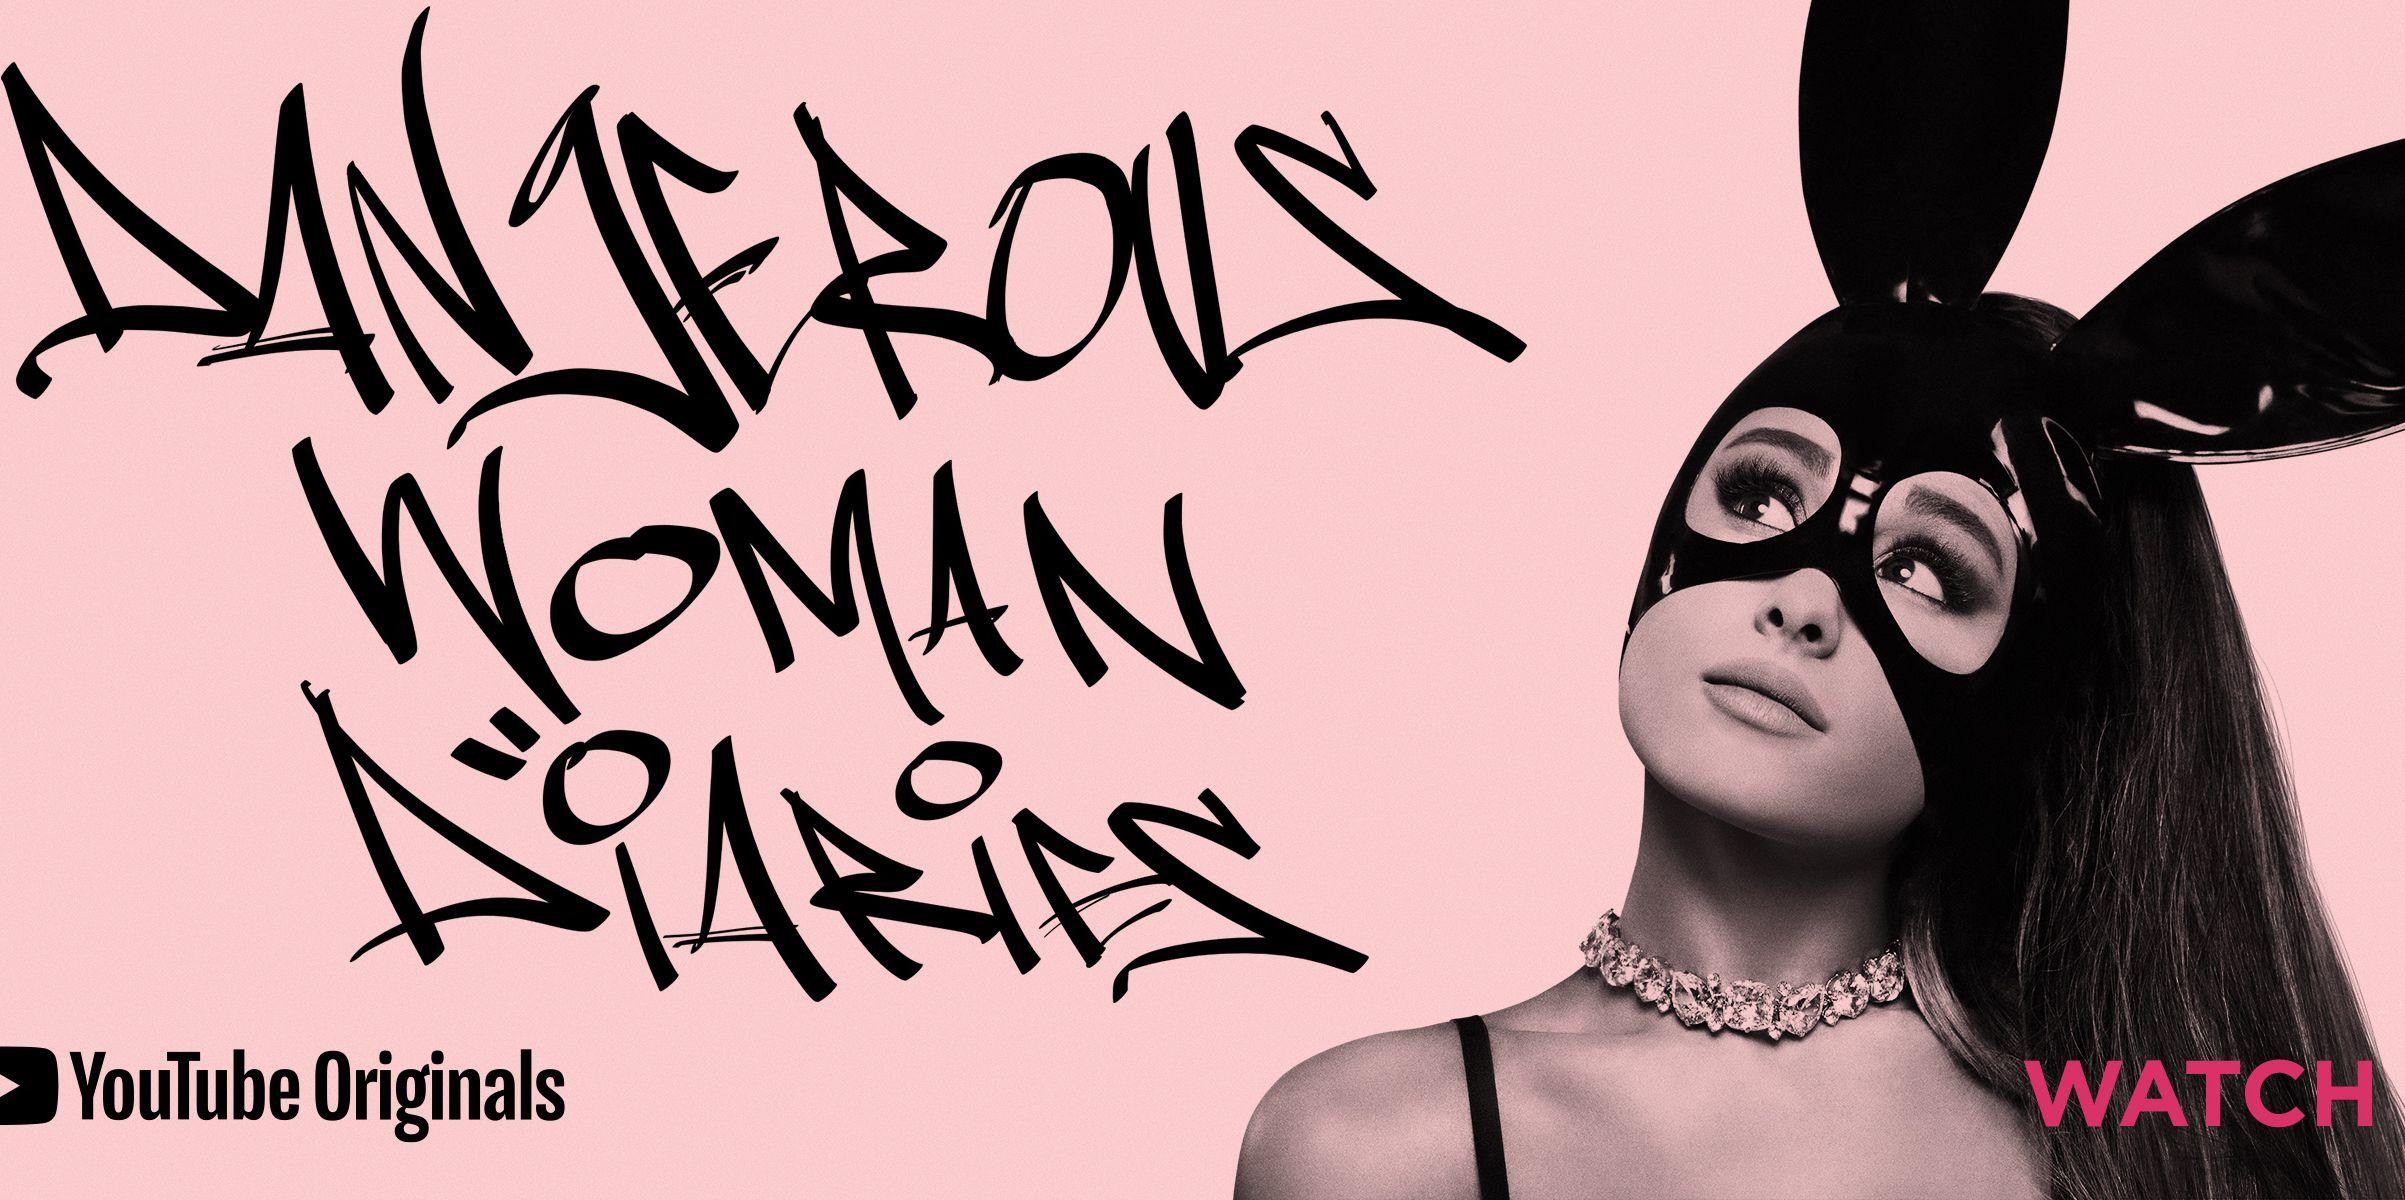 Ariana Grande youtube docuseries